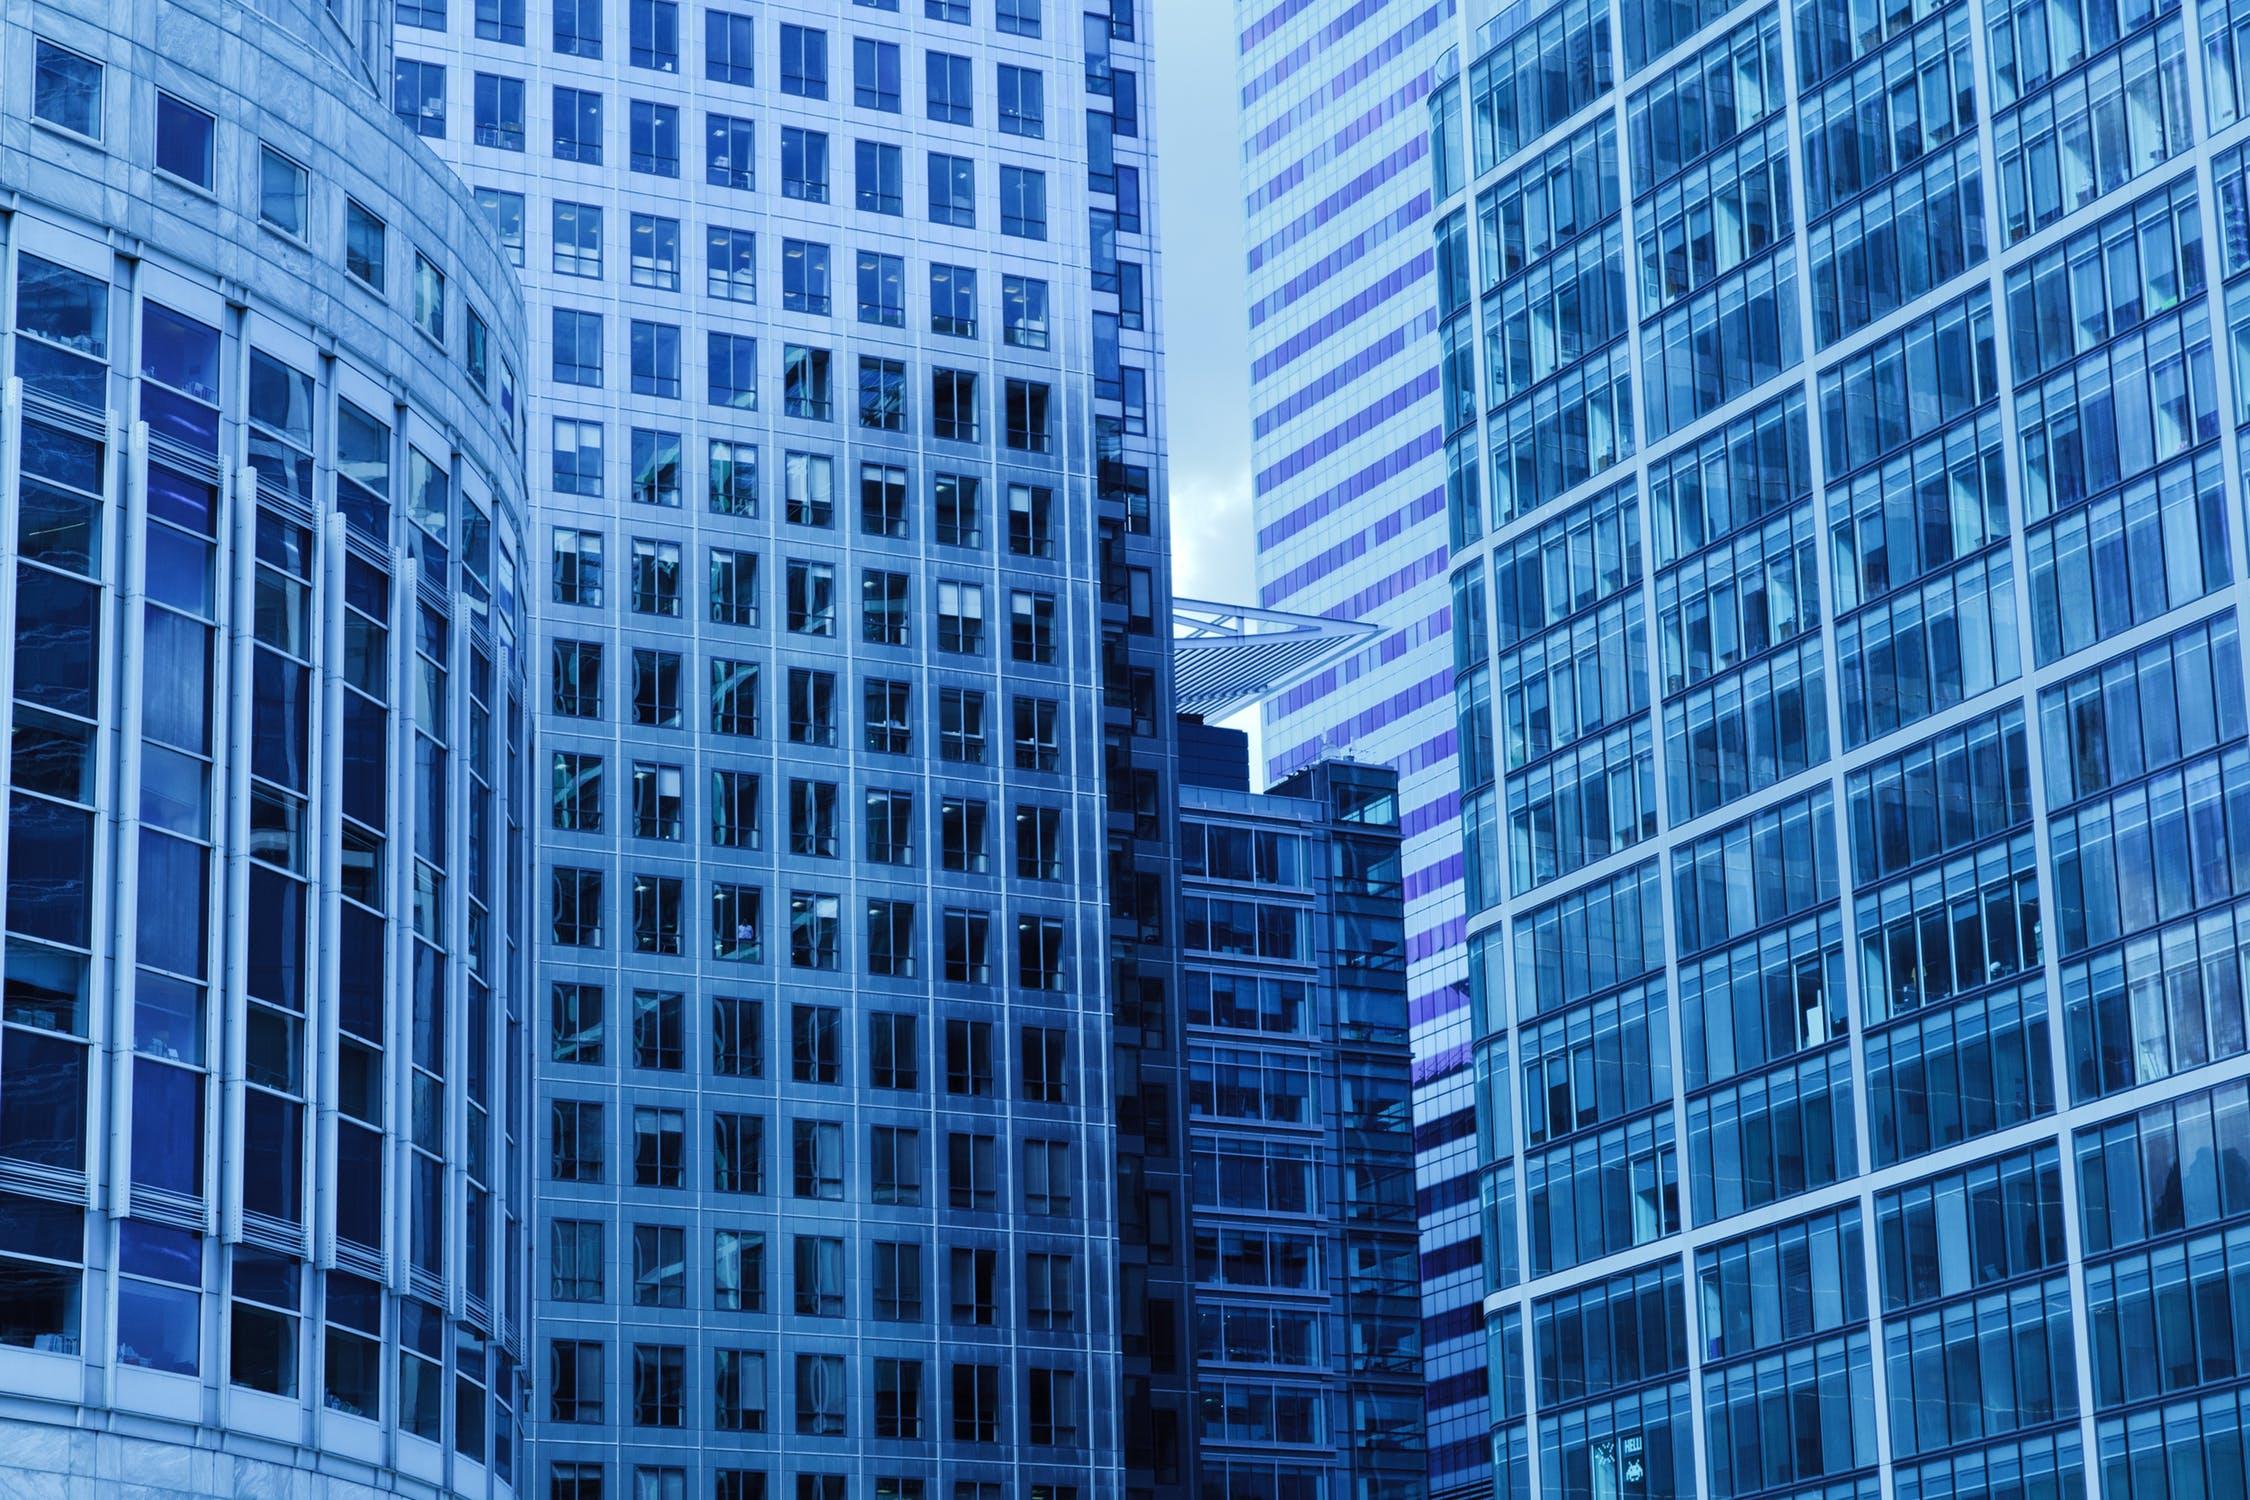 Tall office blocks in city